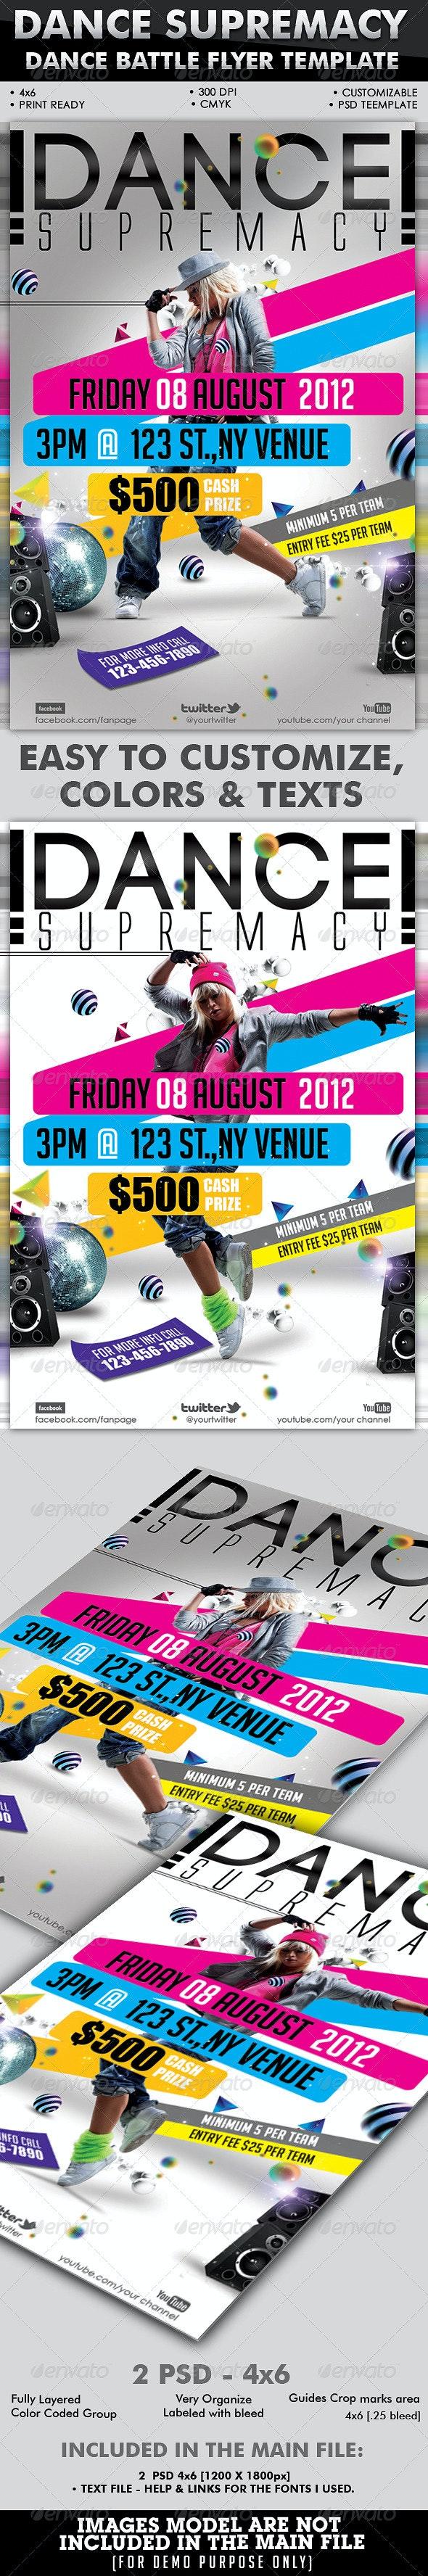 Dance Supremacy/Dance Battle Flyer Template - Clubs & Parties Events